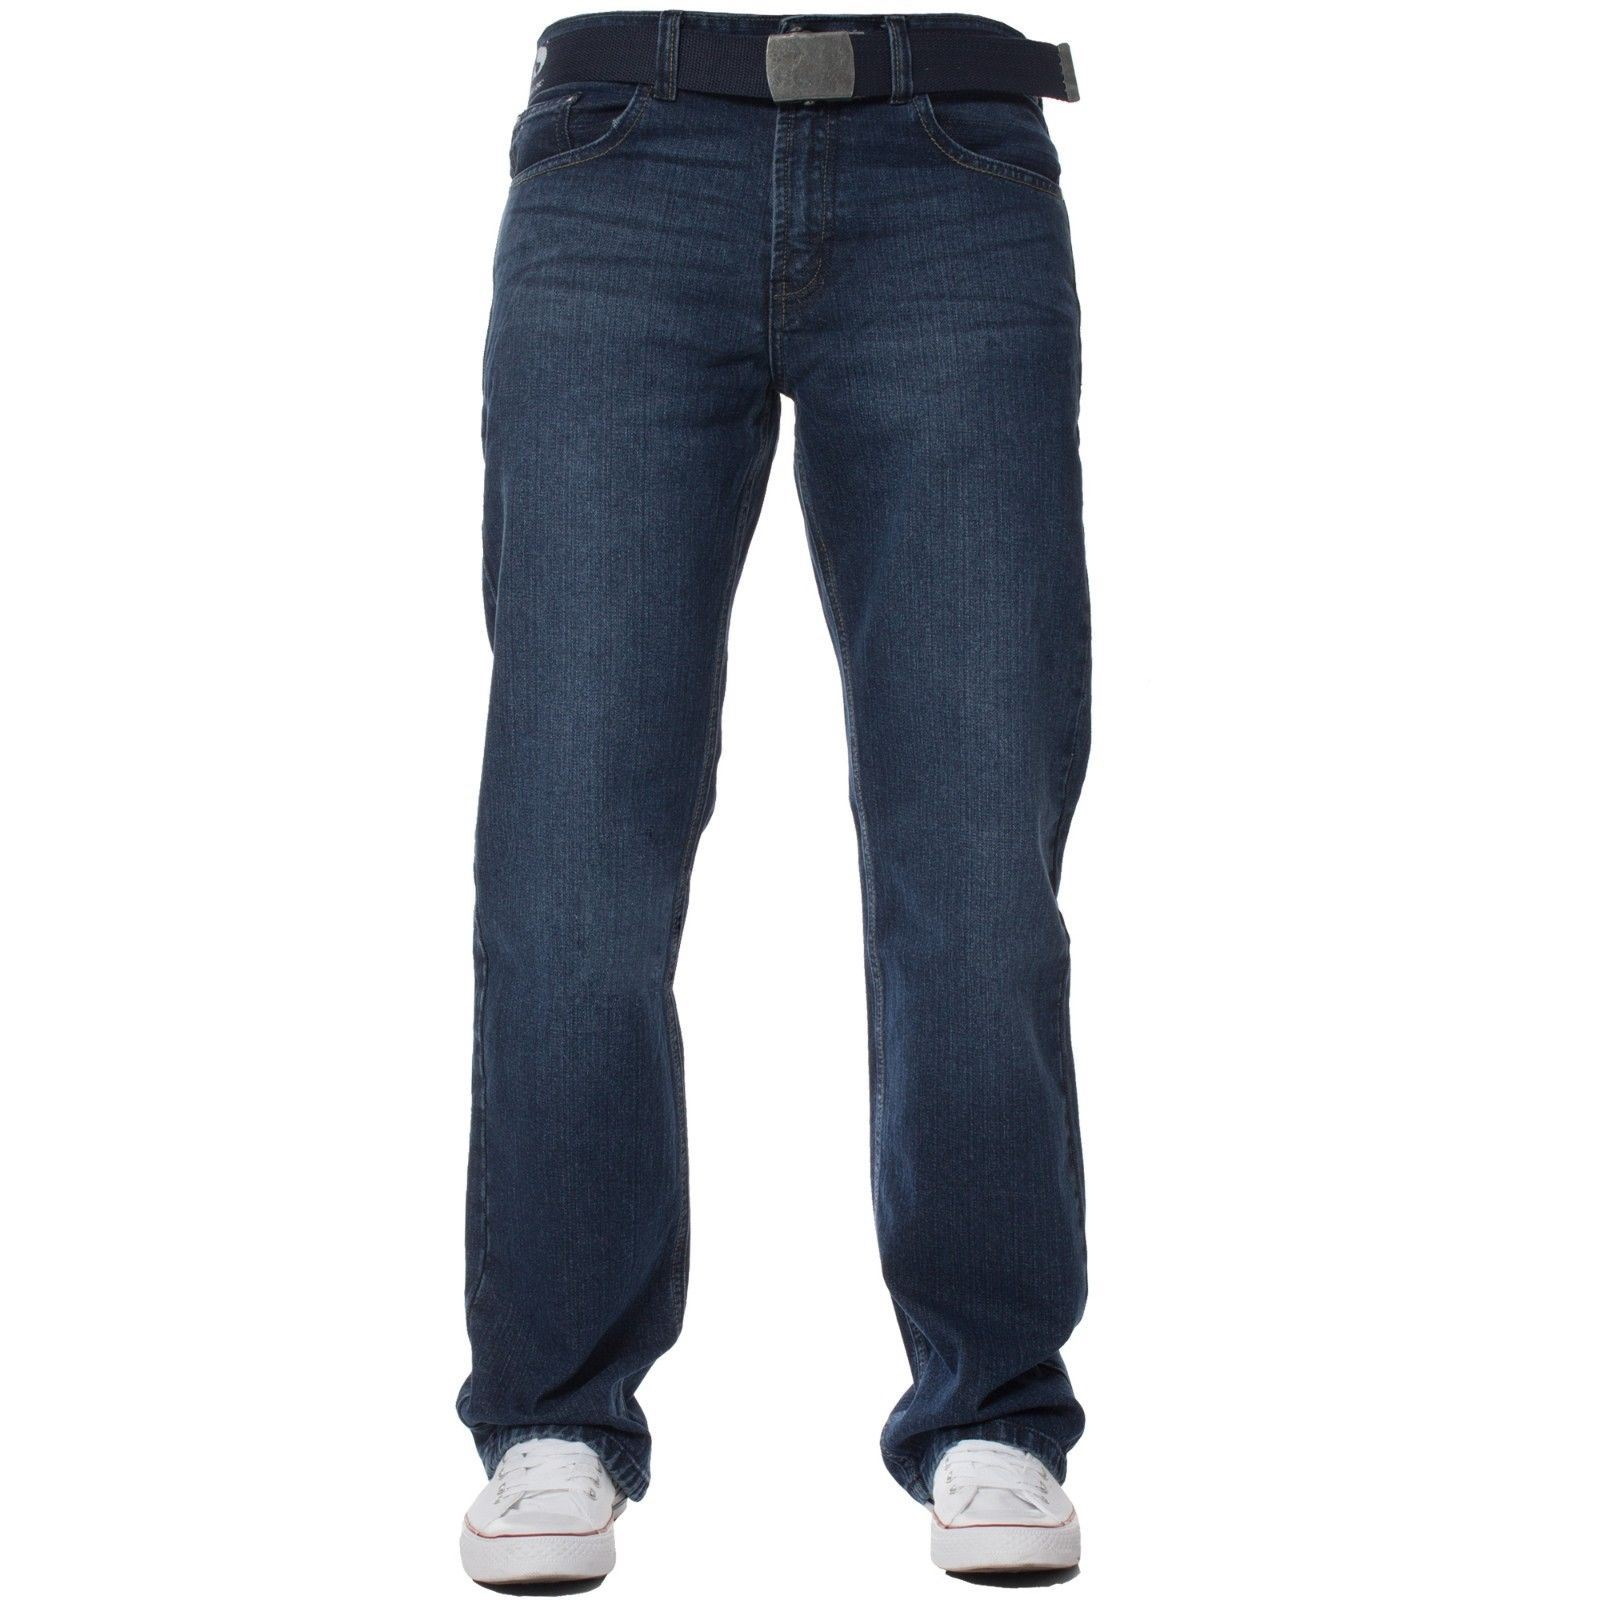 Mens Straight Leg Jeans Regular Fit Denim Pants Cotton Free Belt All Waist Sizes